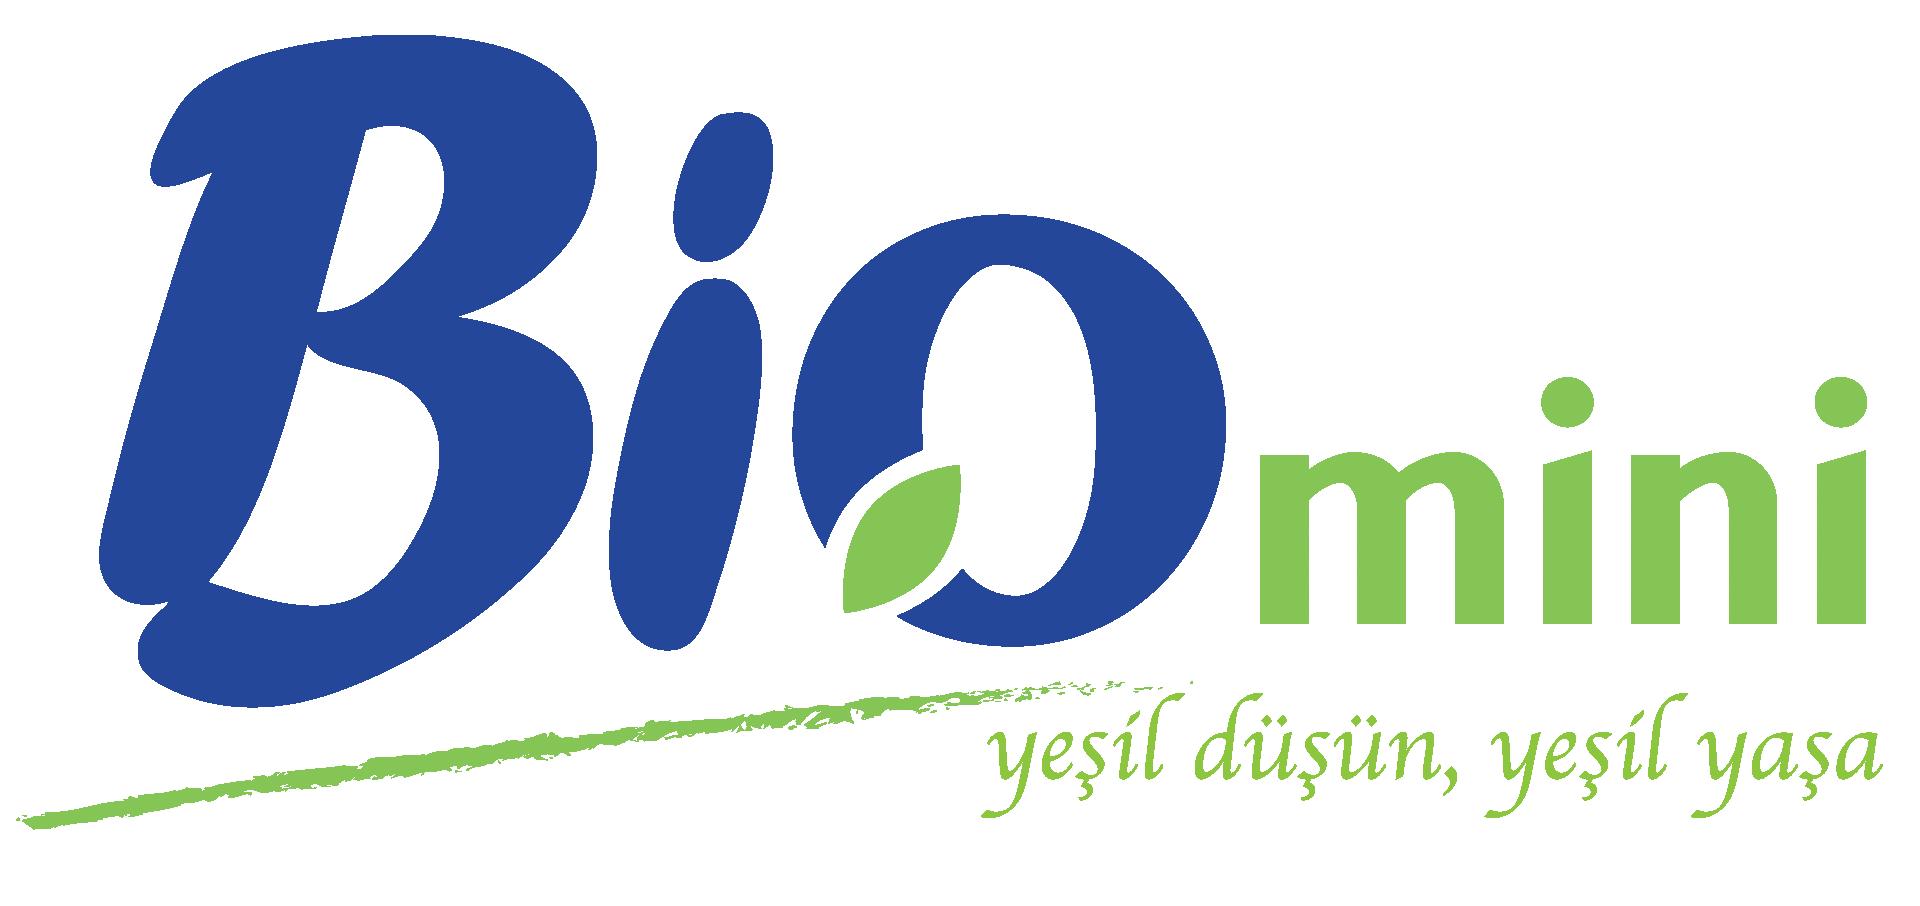 Biomini - Organik ve doðal sertifikalý ürünler maðazasý